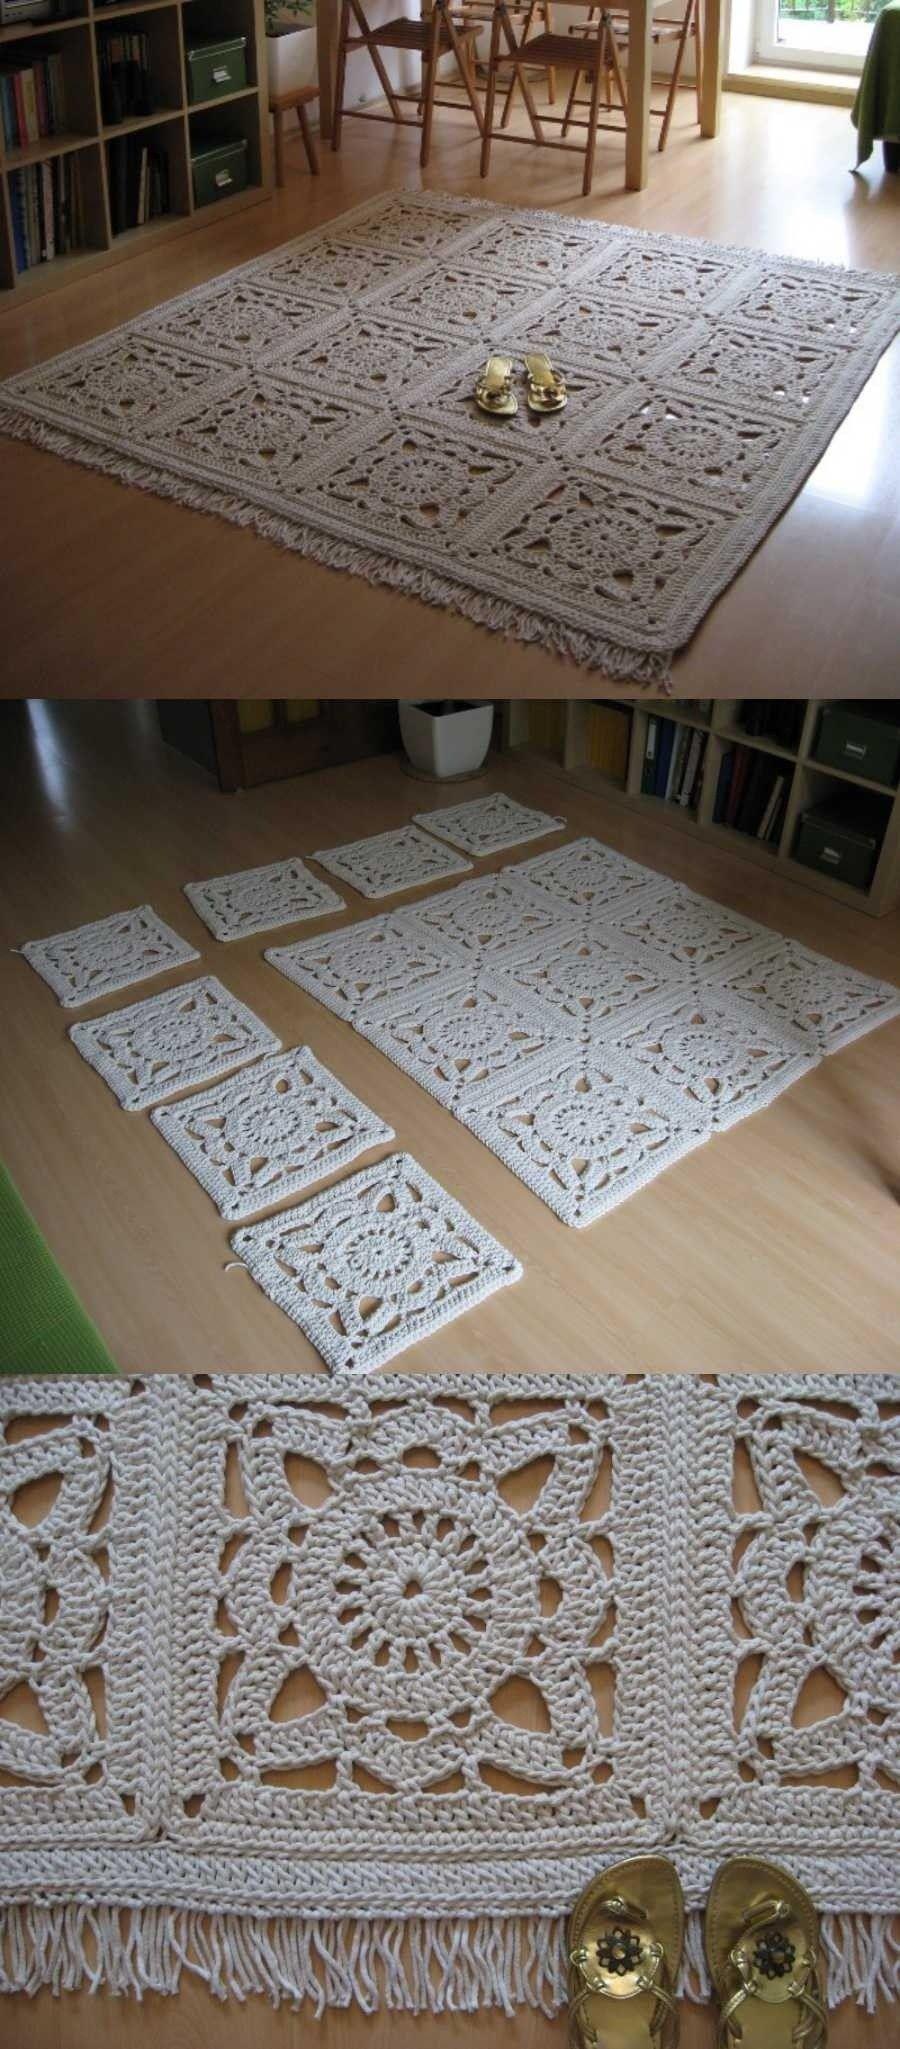 Diy 10 Tapetes De Croche Fora Do Banheiro Tapete De Croche